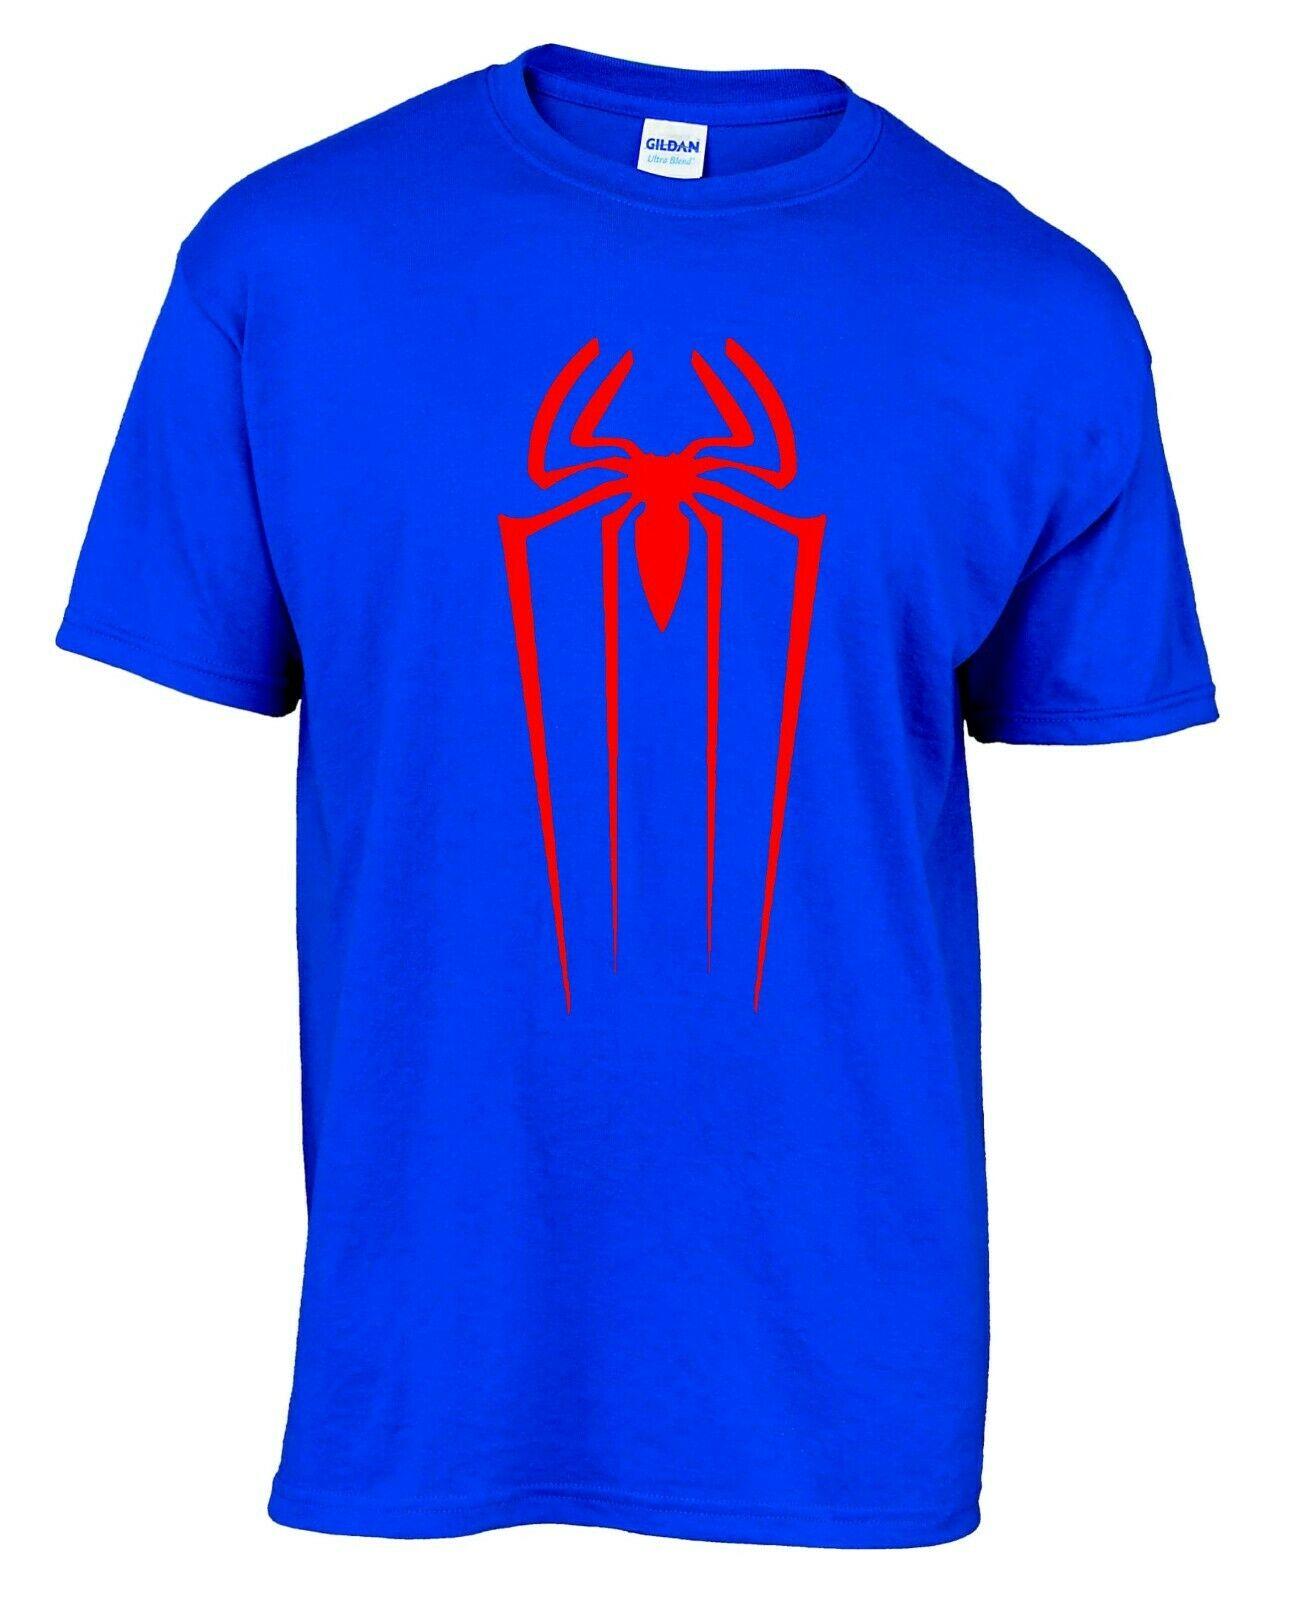 Amon Amarth 1000 Burning Arrows Shirt S M L Xl Xxl Official Metal T-Shirt Tshirt